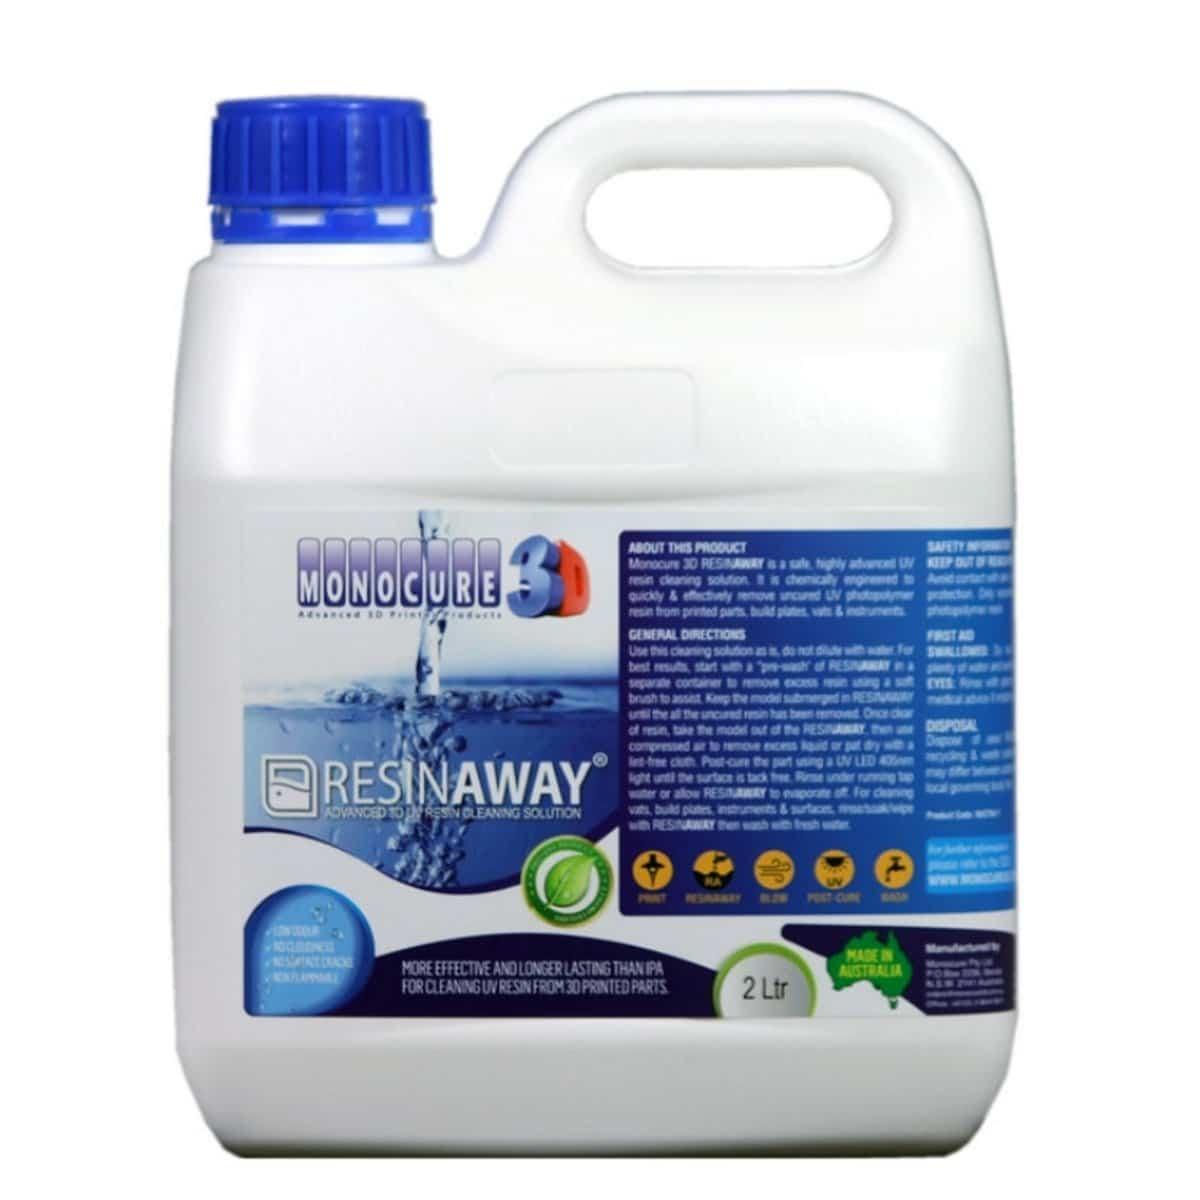 Image of Monocure 3D RESINAWAY Cleaner - 2 liter